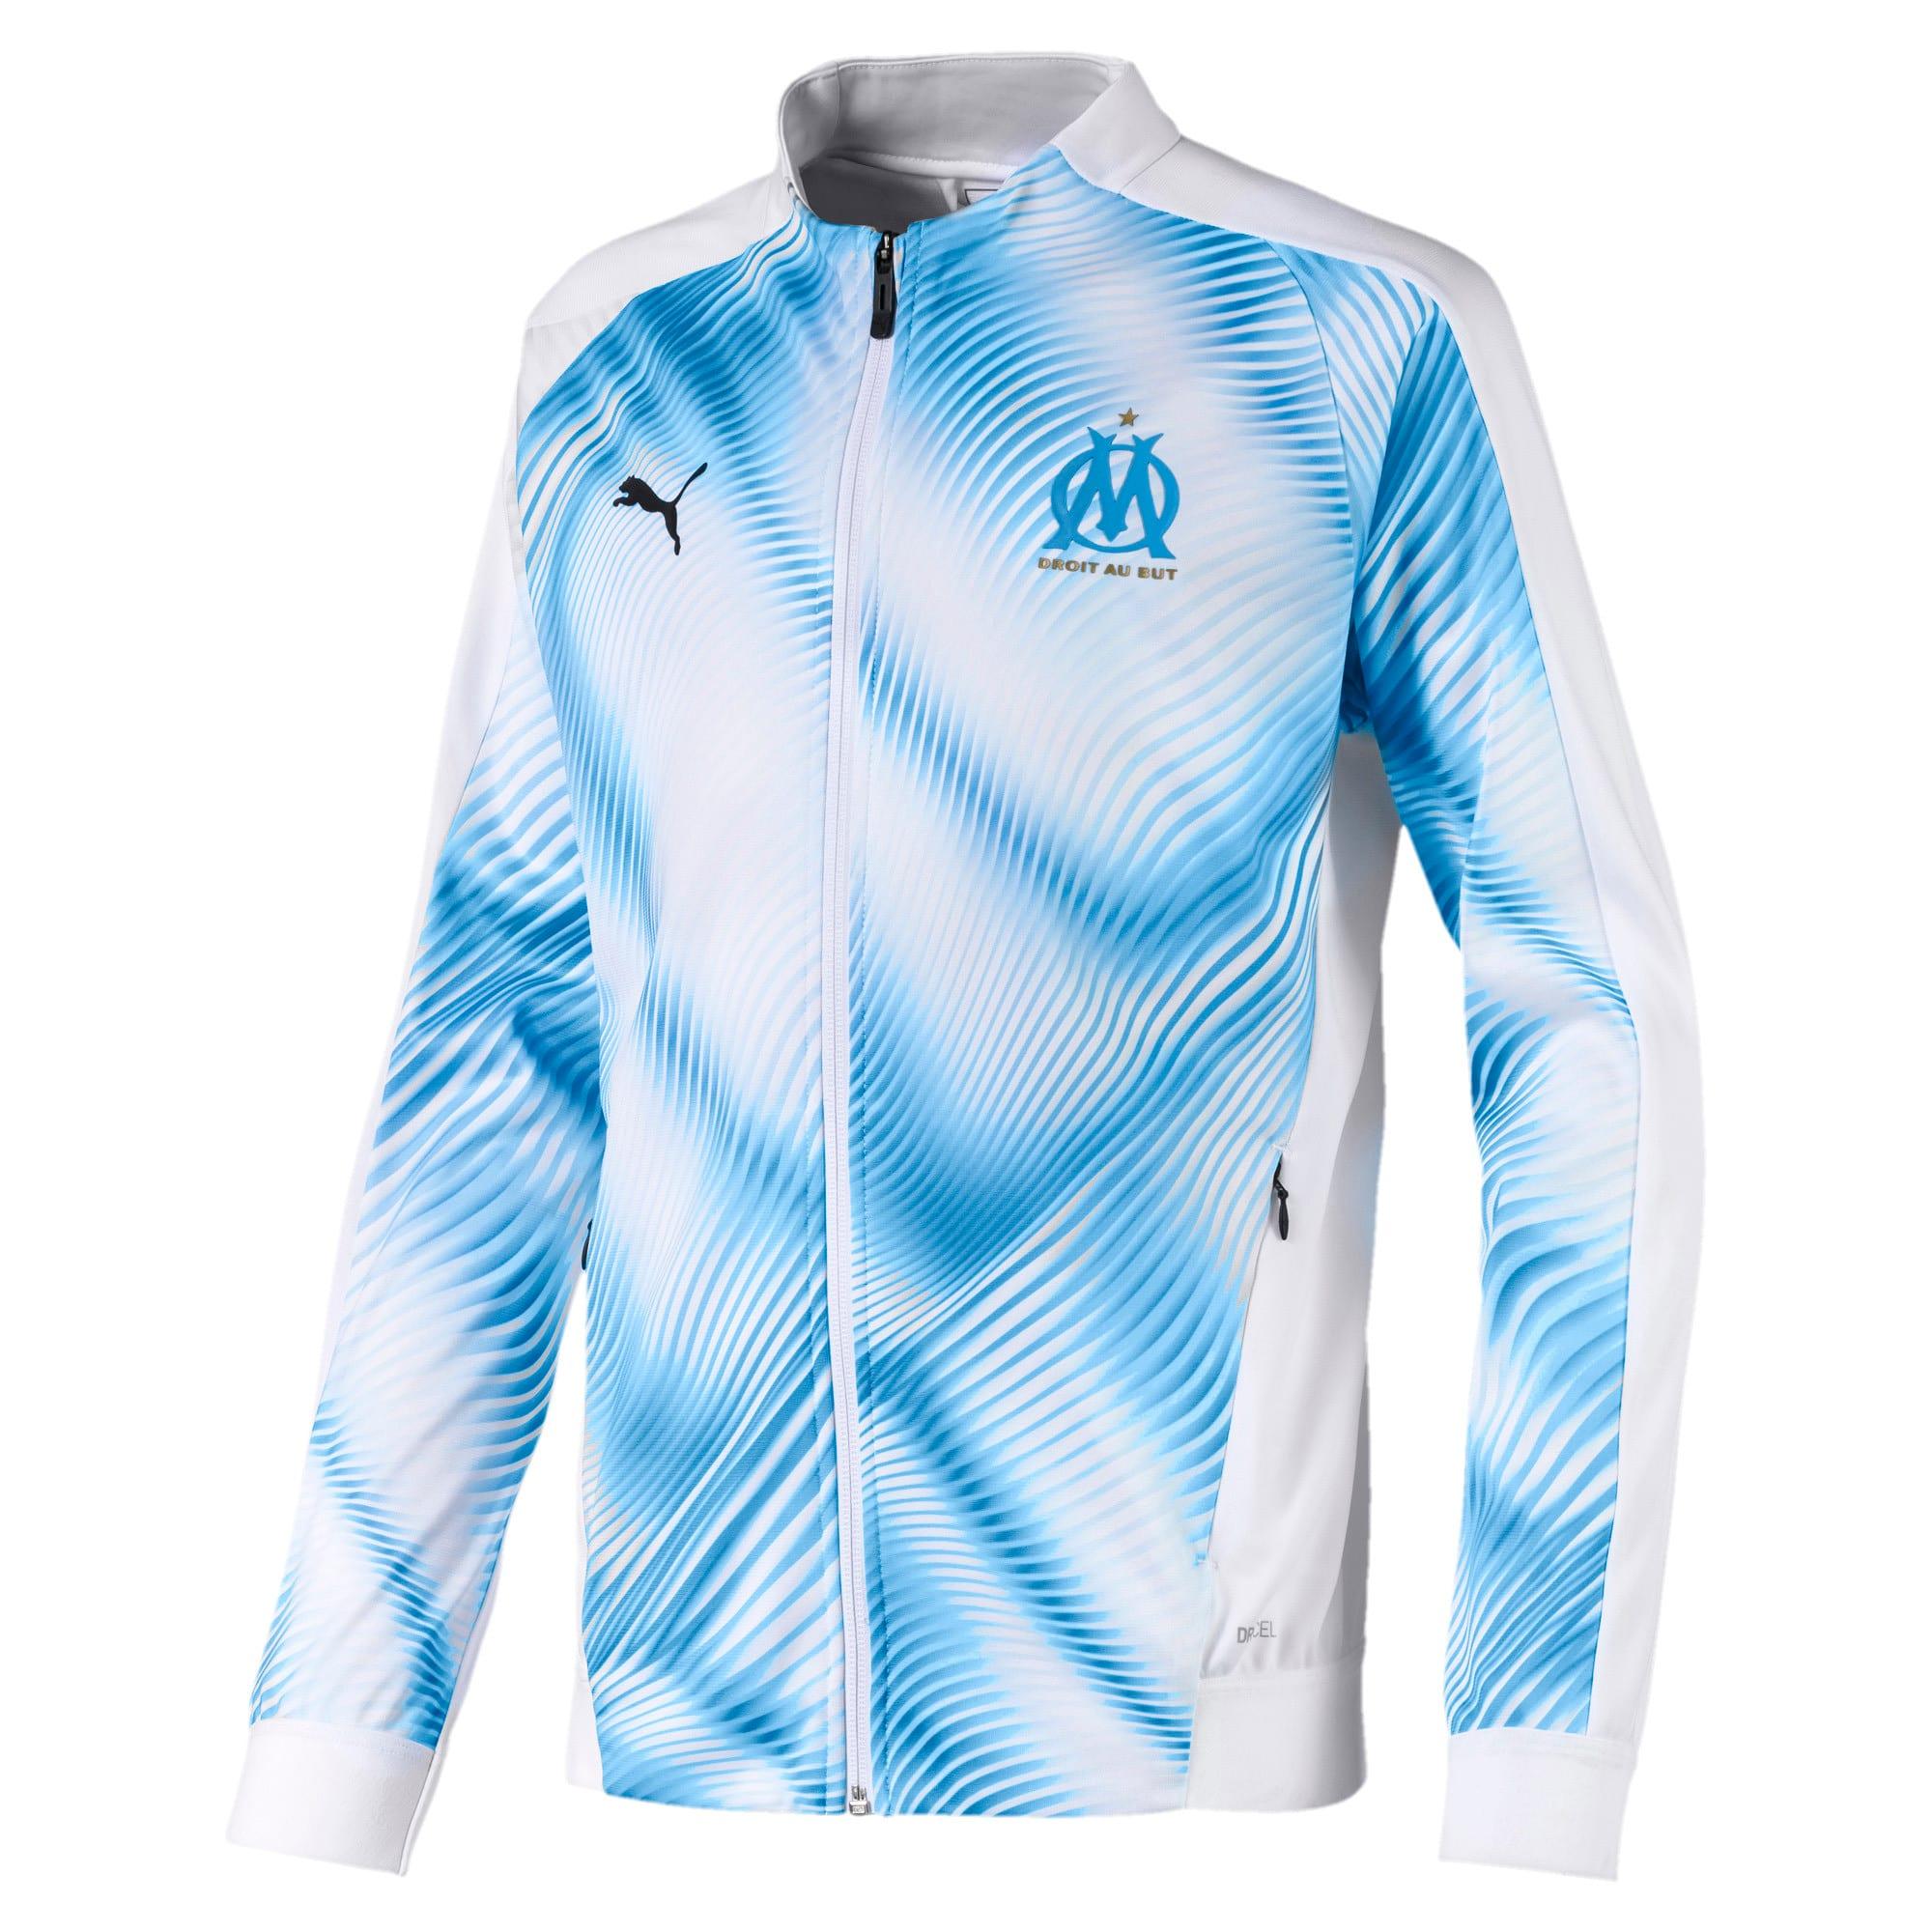 Thumbnail 1 of Olympique de Marseille Stadium Jungen Replica Jacke, Puma White-Bleu Azur, medium